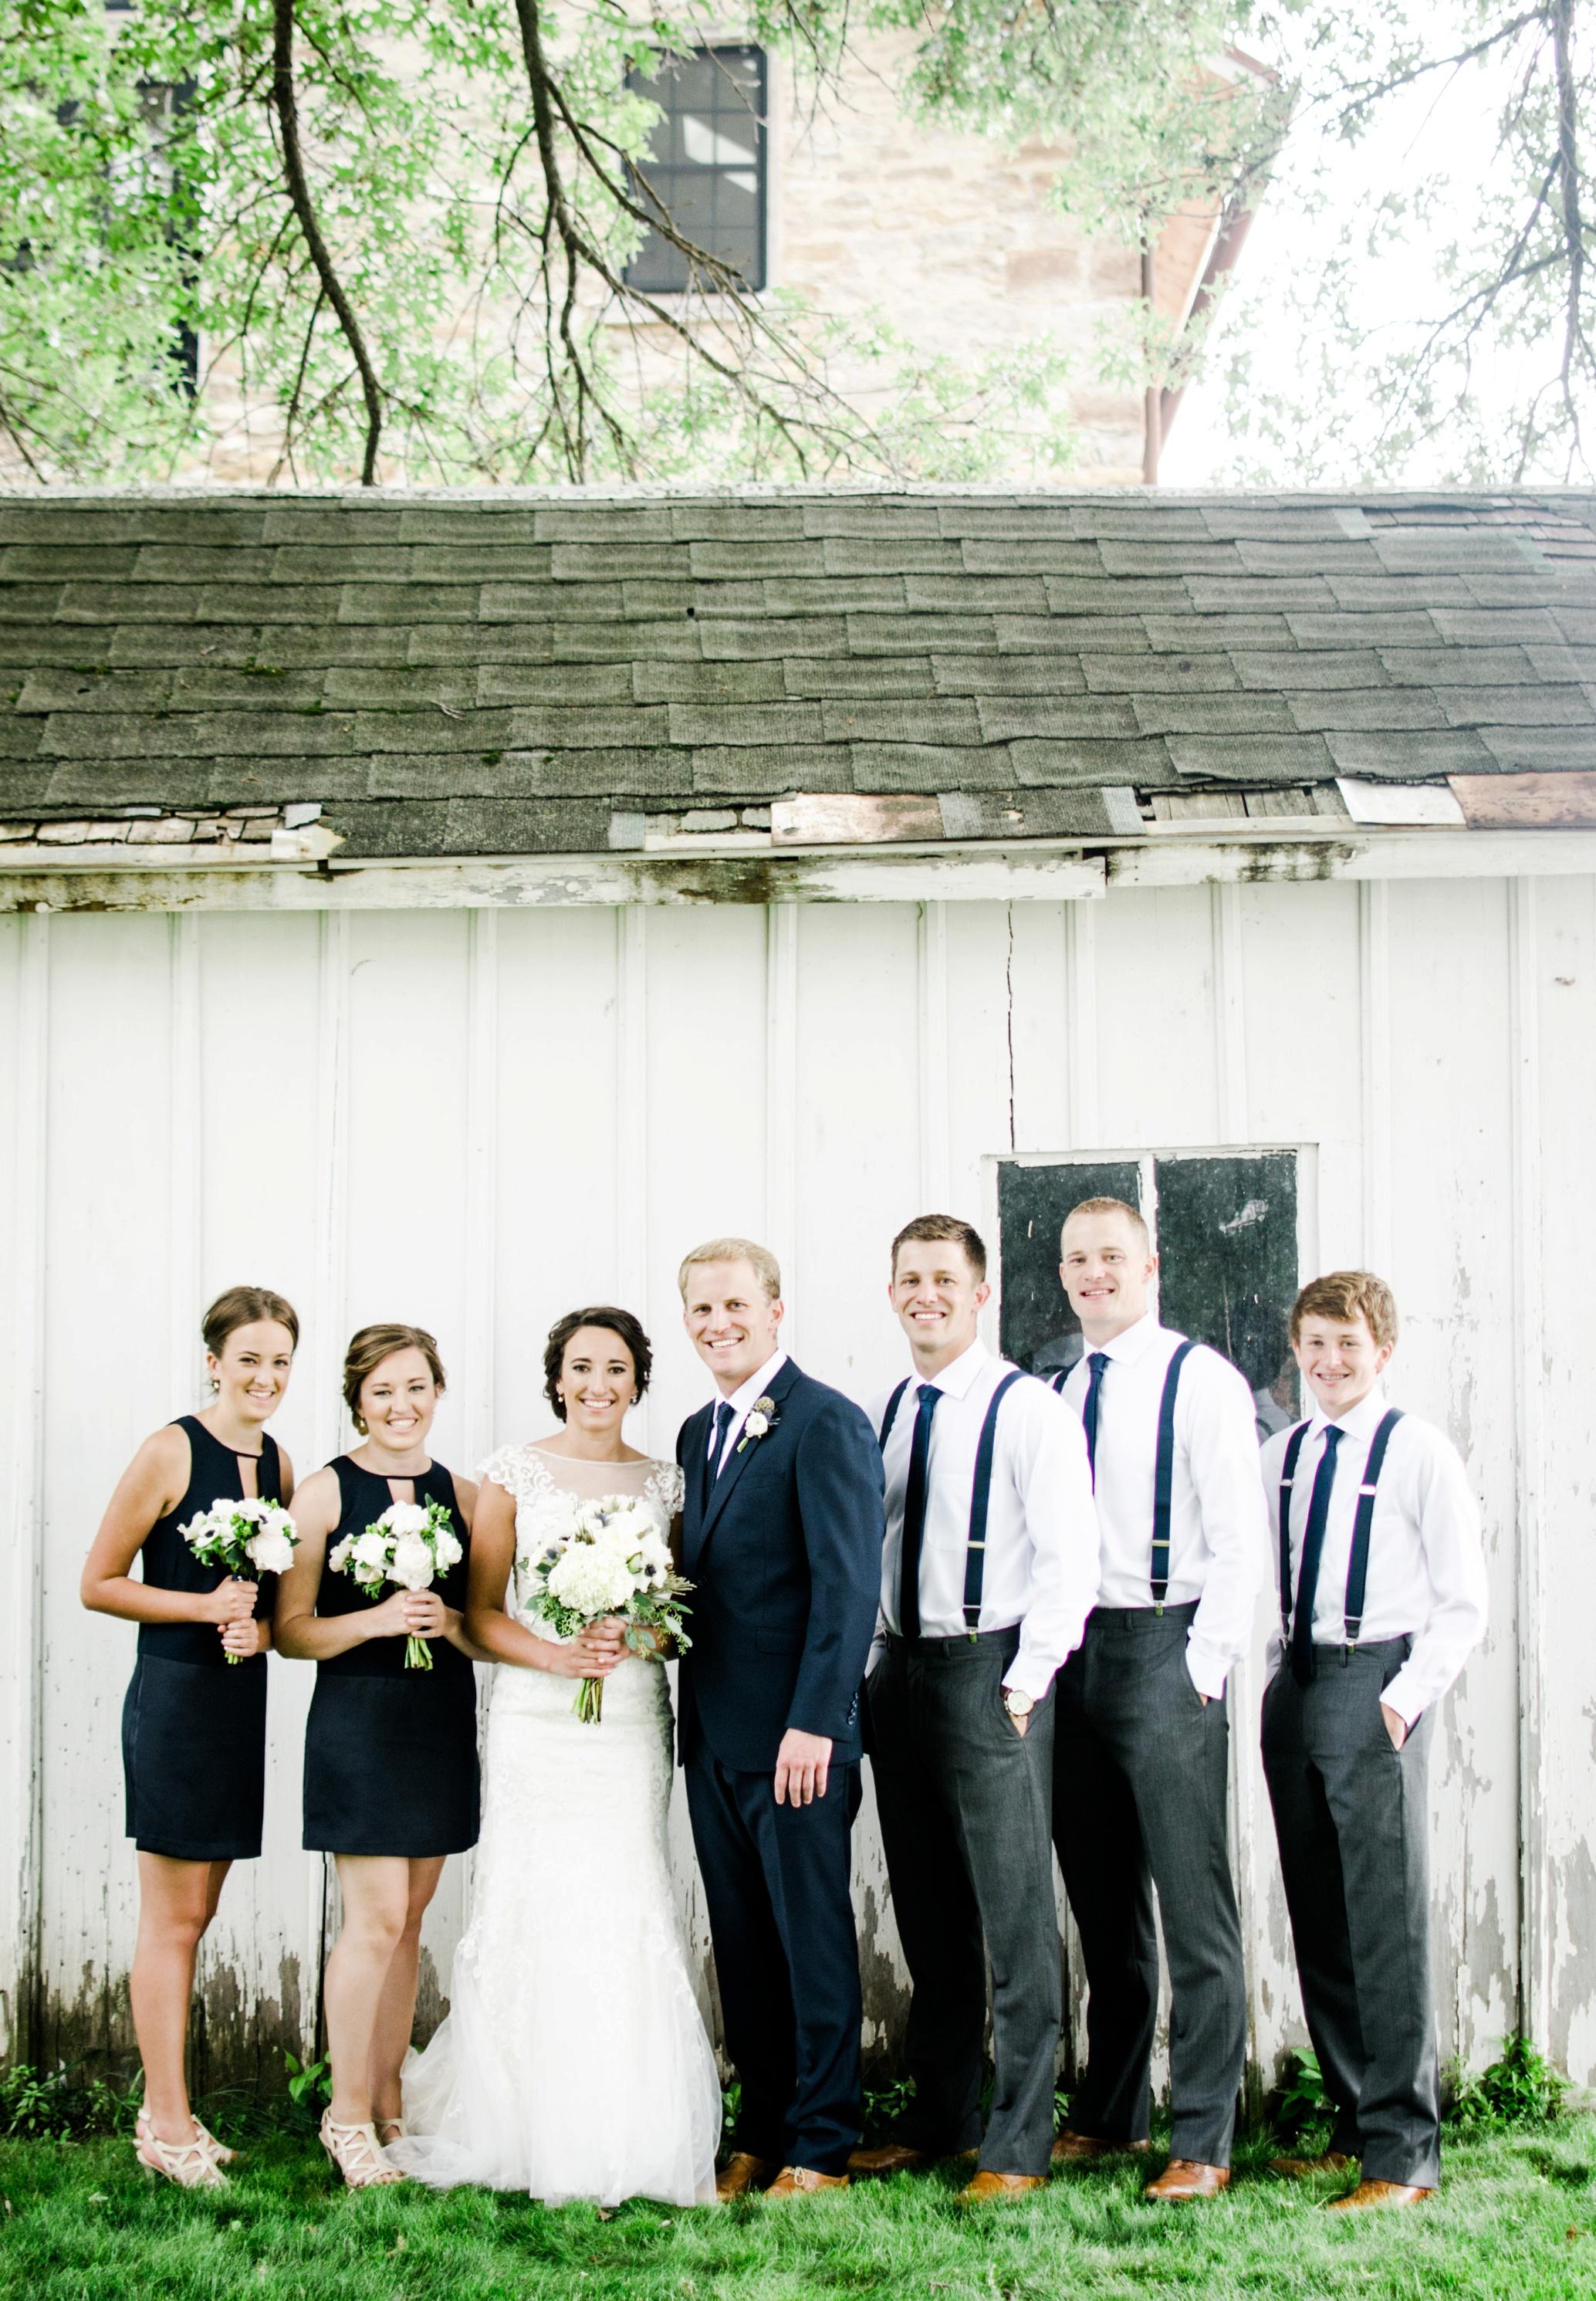 Palmer House and Stable Solon, IA | Ali Leigh Photo Minneapolis Wedding Photographer_0253.jpg